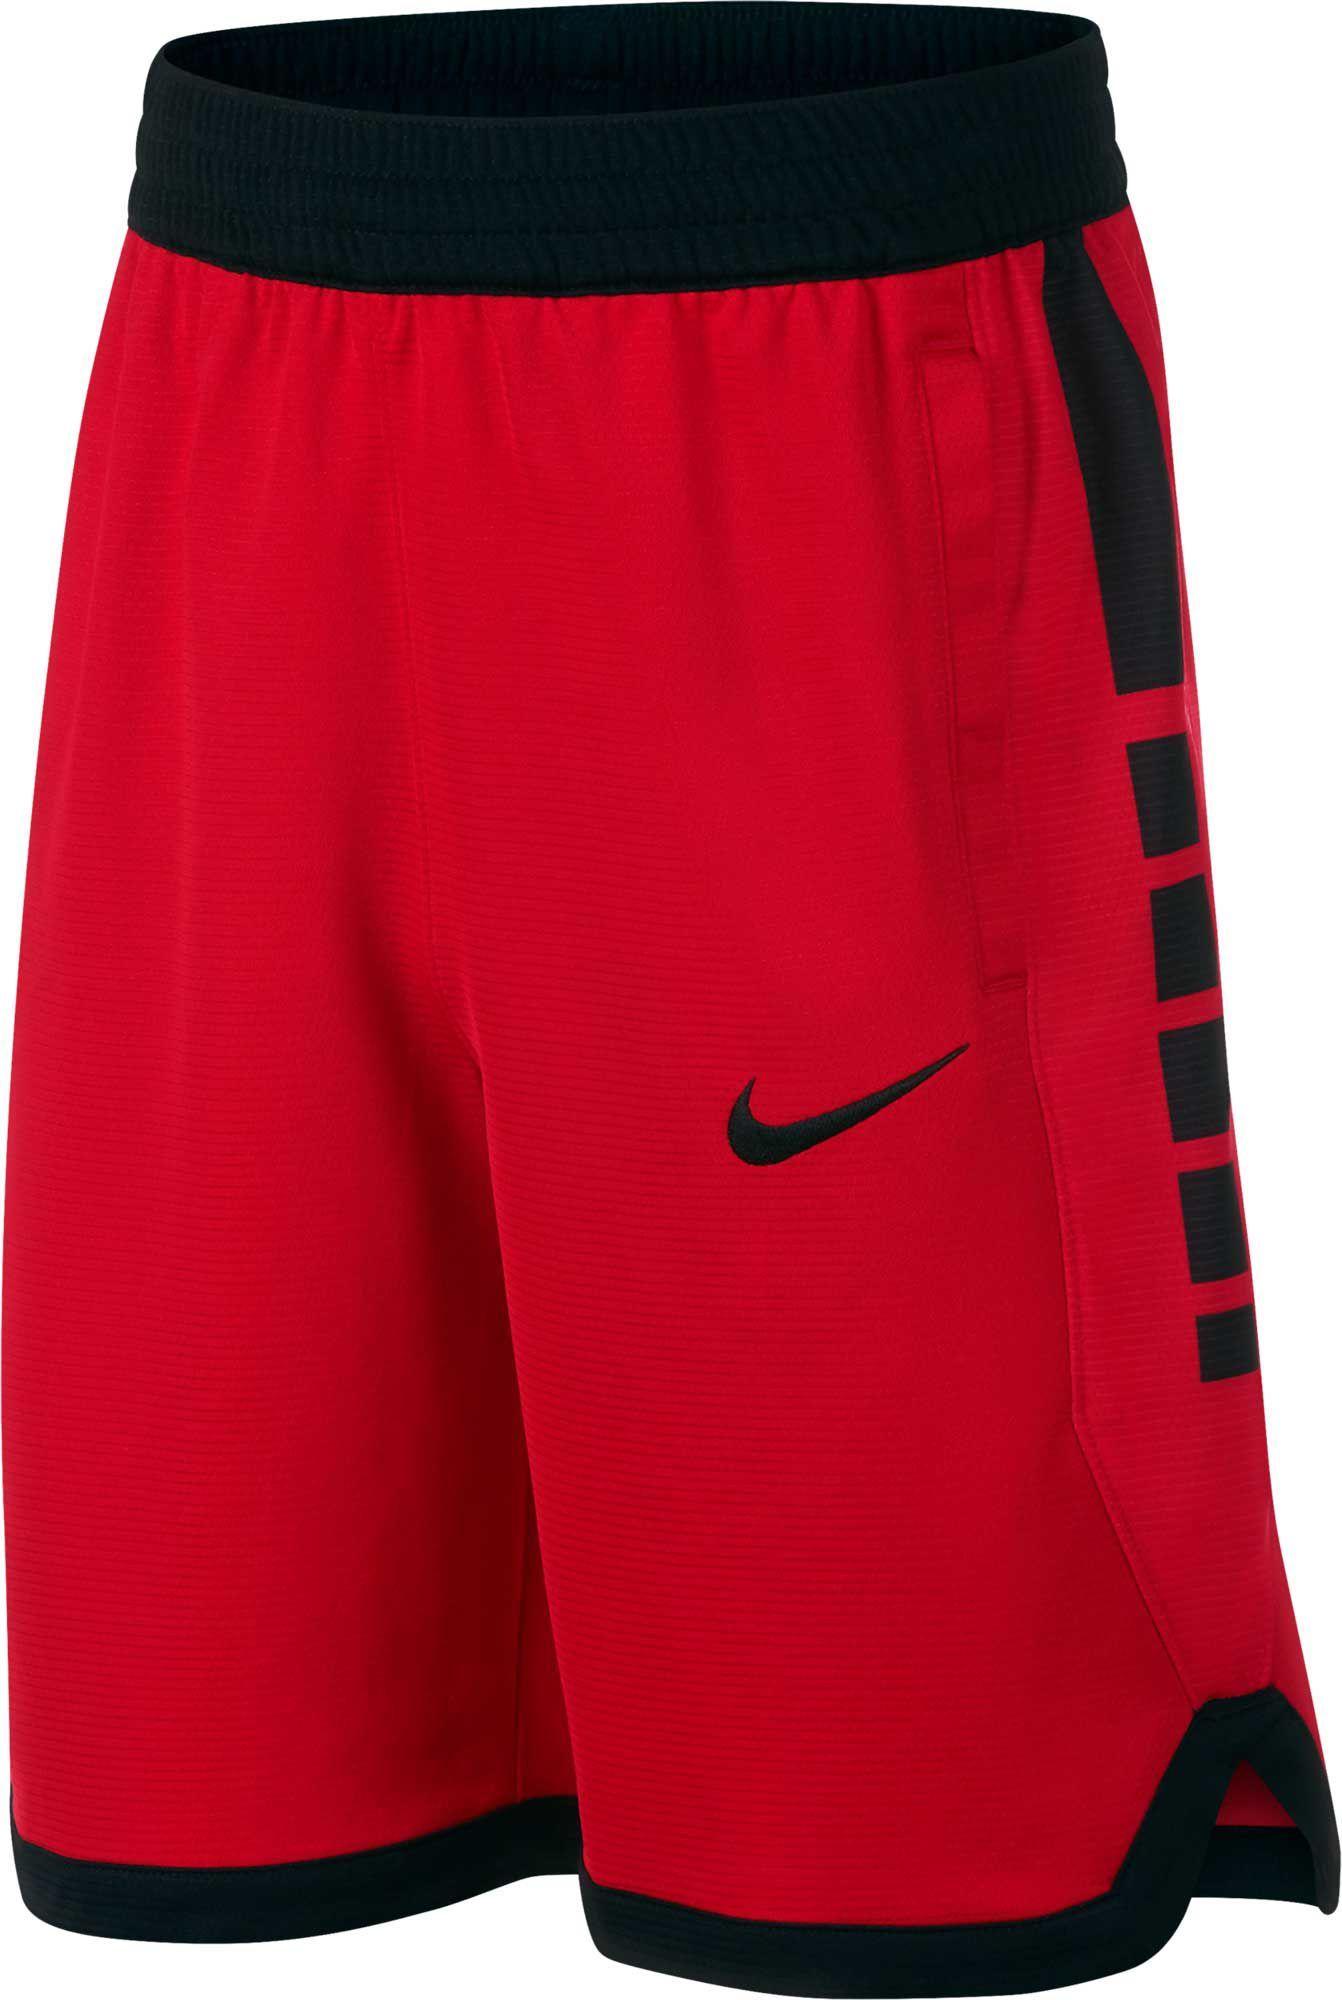 Nike Boys Dri Fit Elite Stripe Basketball Shorts In 2020 Basketball Shorts Fashion Basketball Clothes